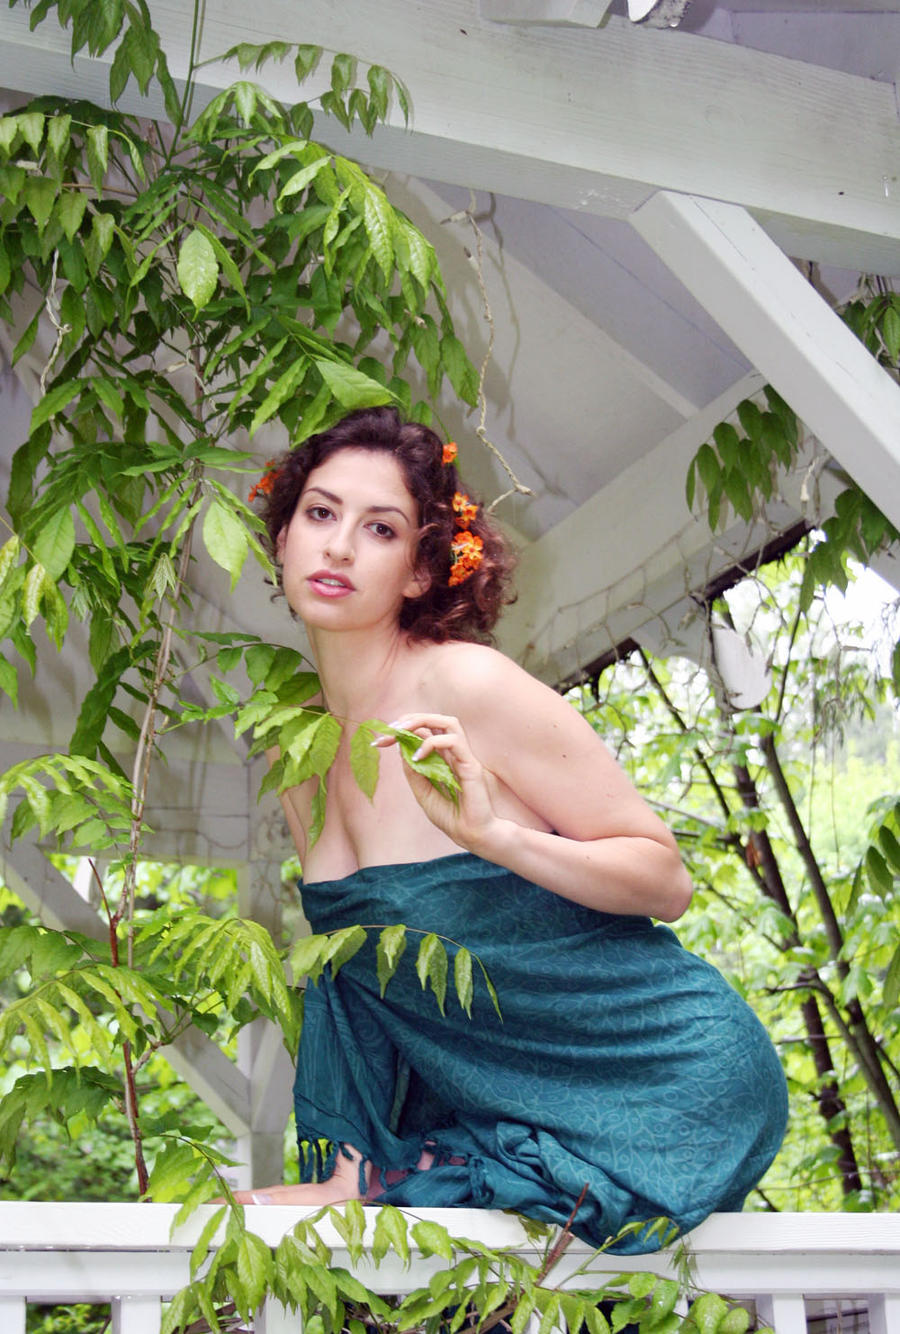 Spring Beauty 34 by rachellcoe